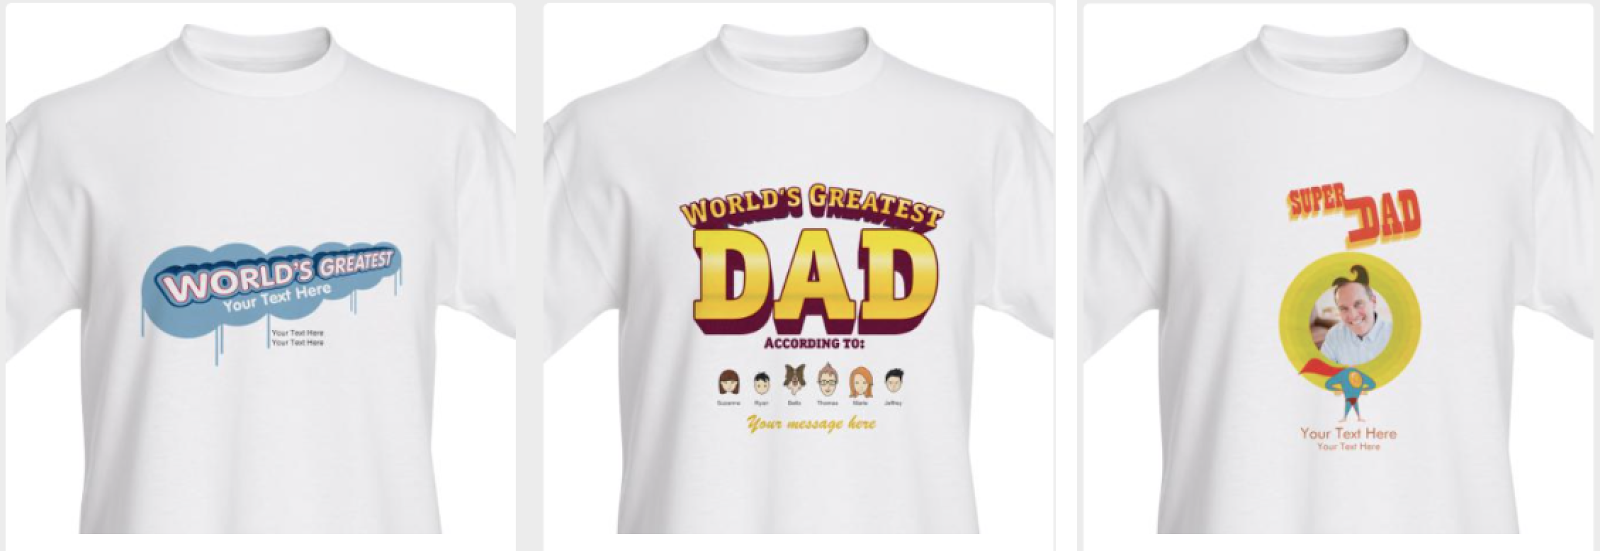 Vistaprint Personalized Fathers Day T Shirts 599 Free